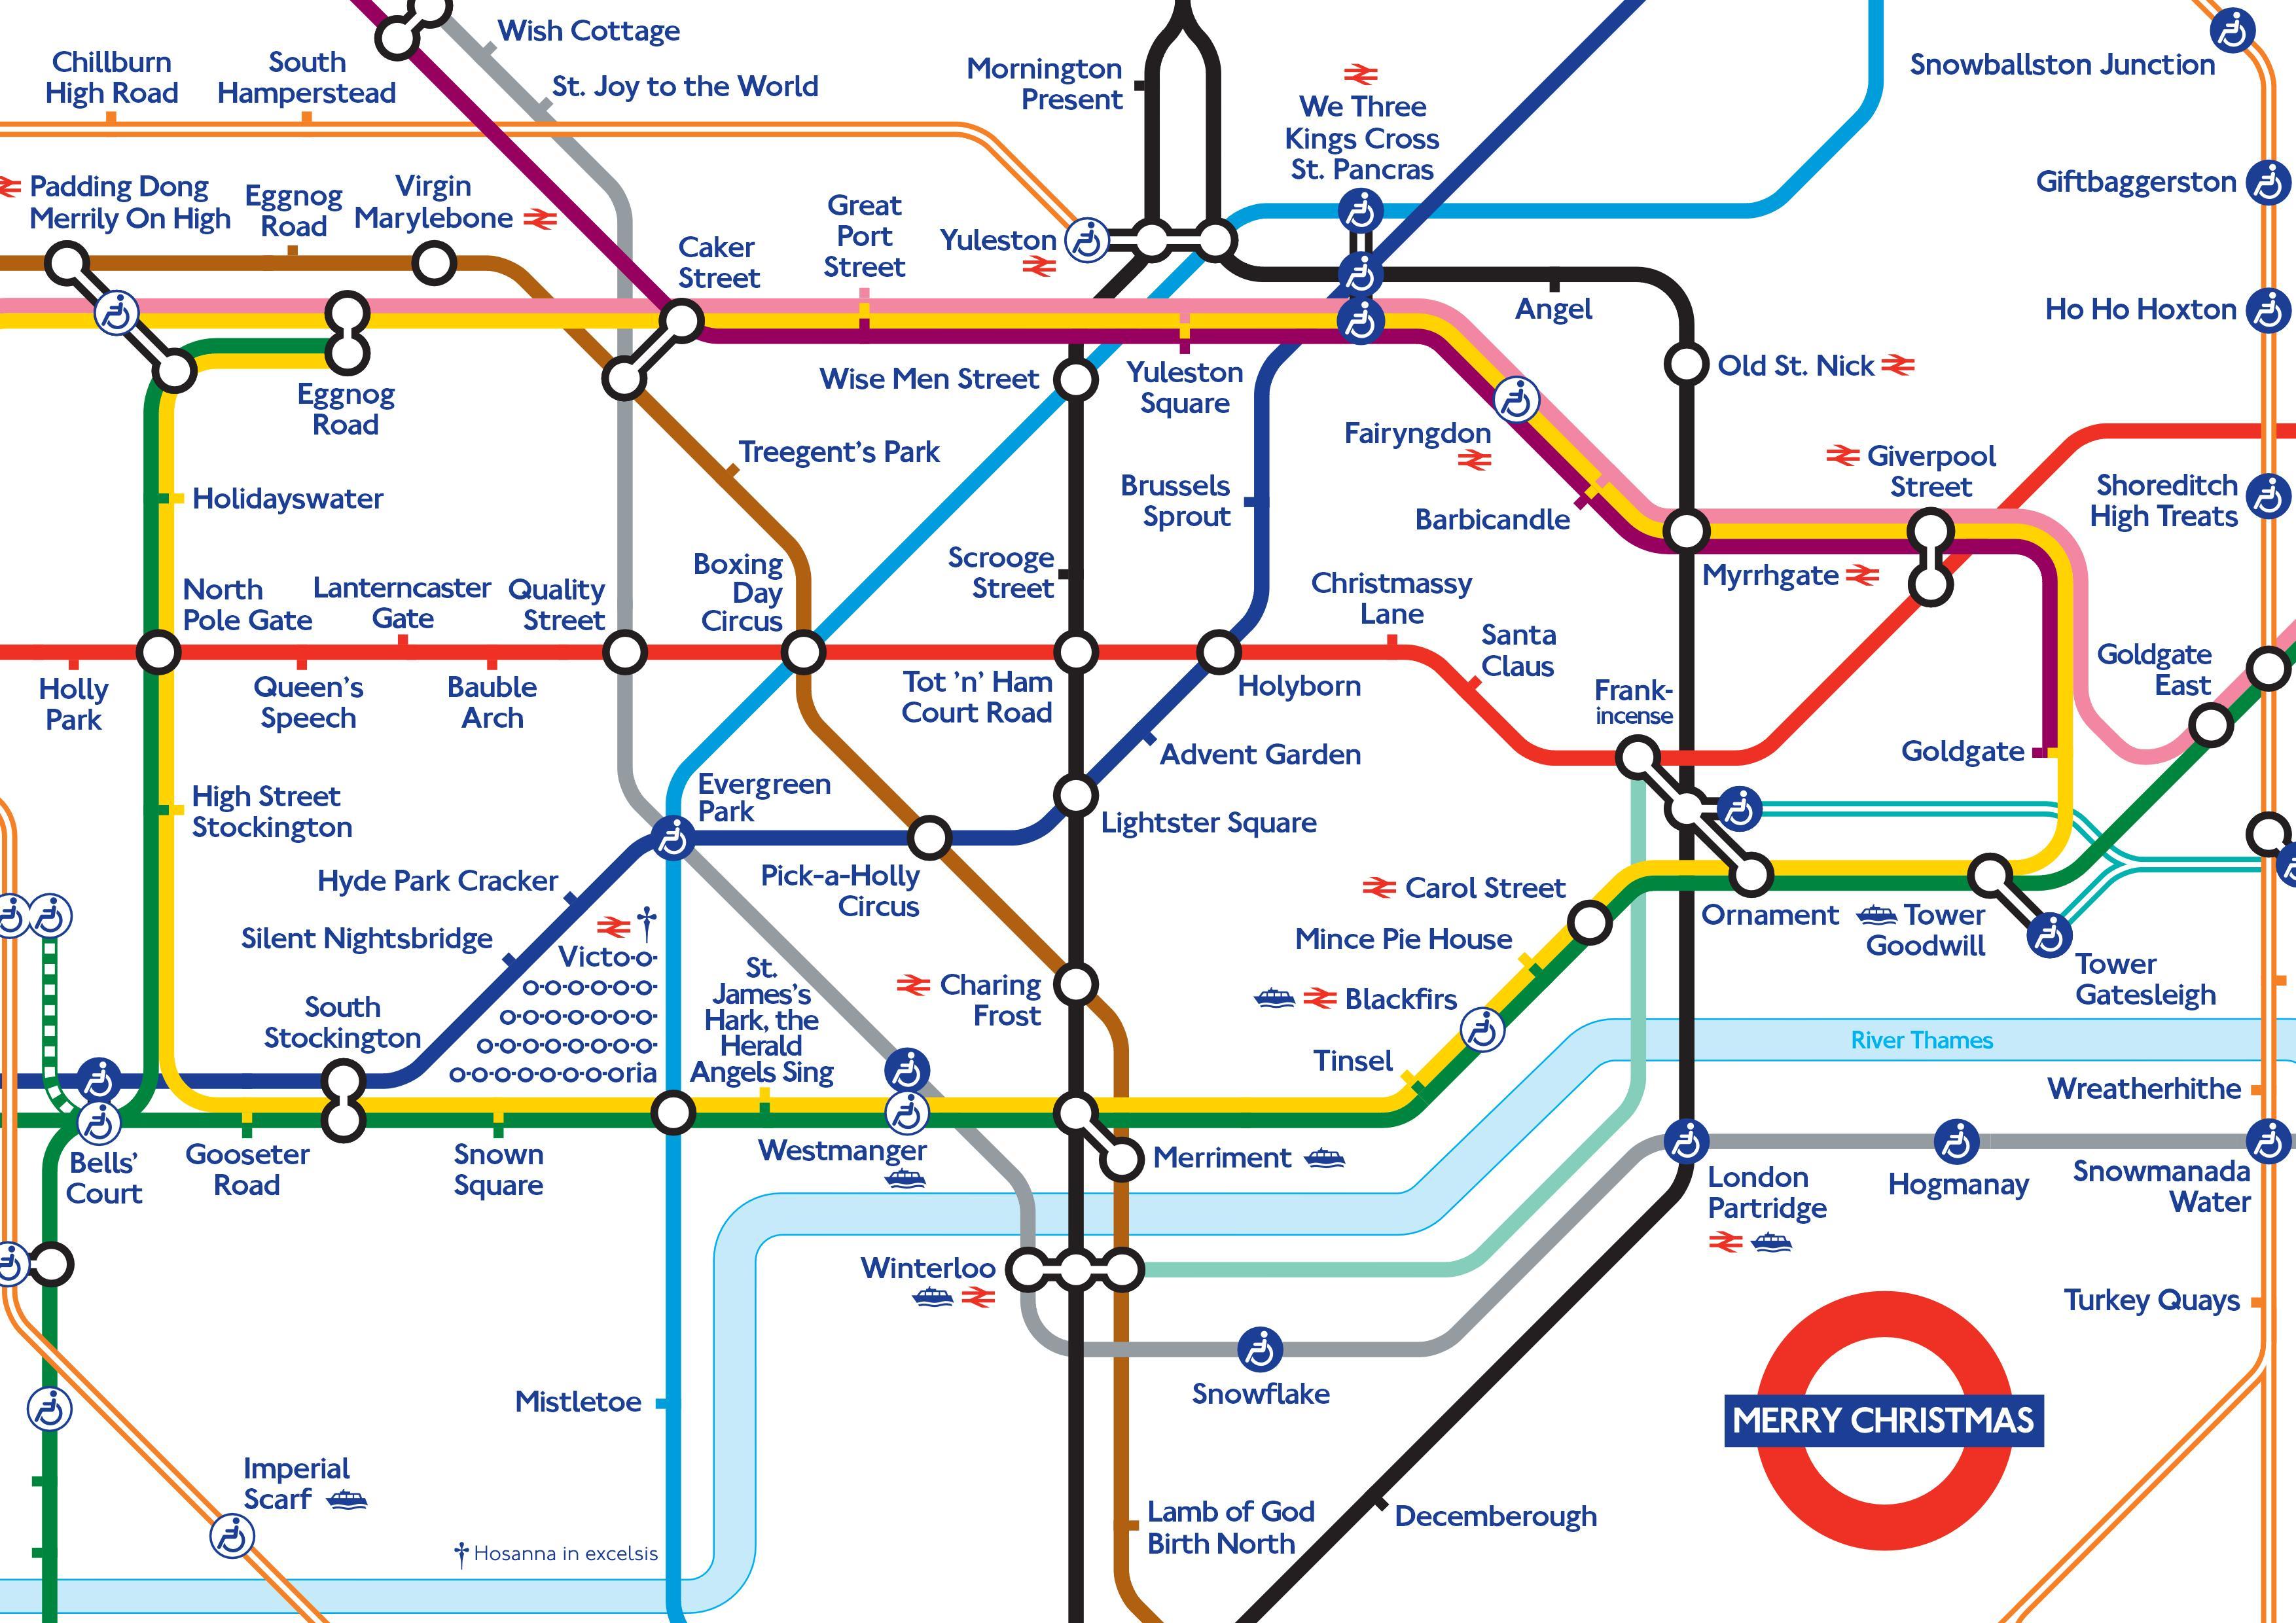 Tube Map 2014 Alternative Tube Maps: Merry Christmas   Londonist Tube Map 2014